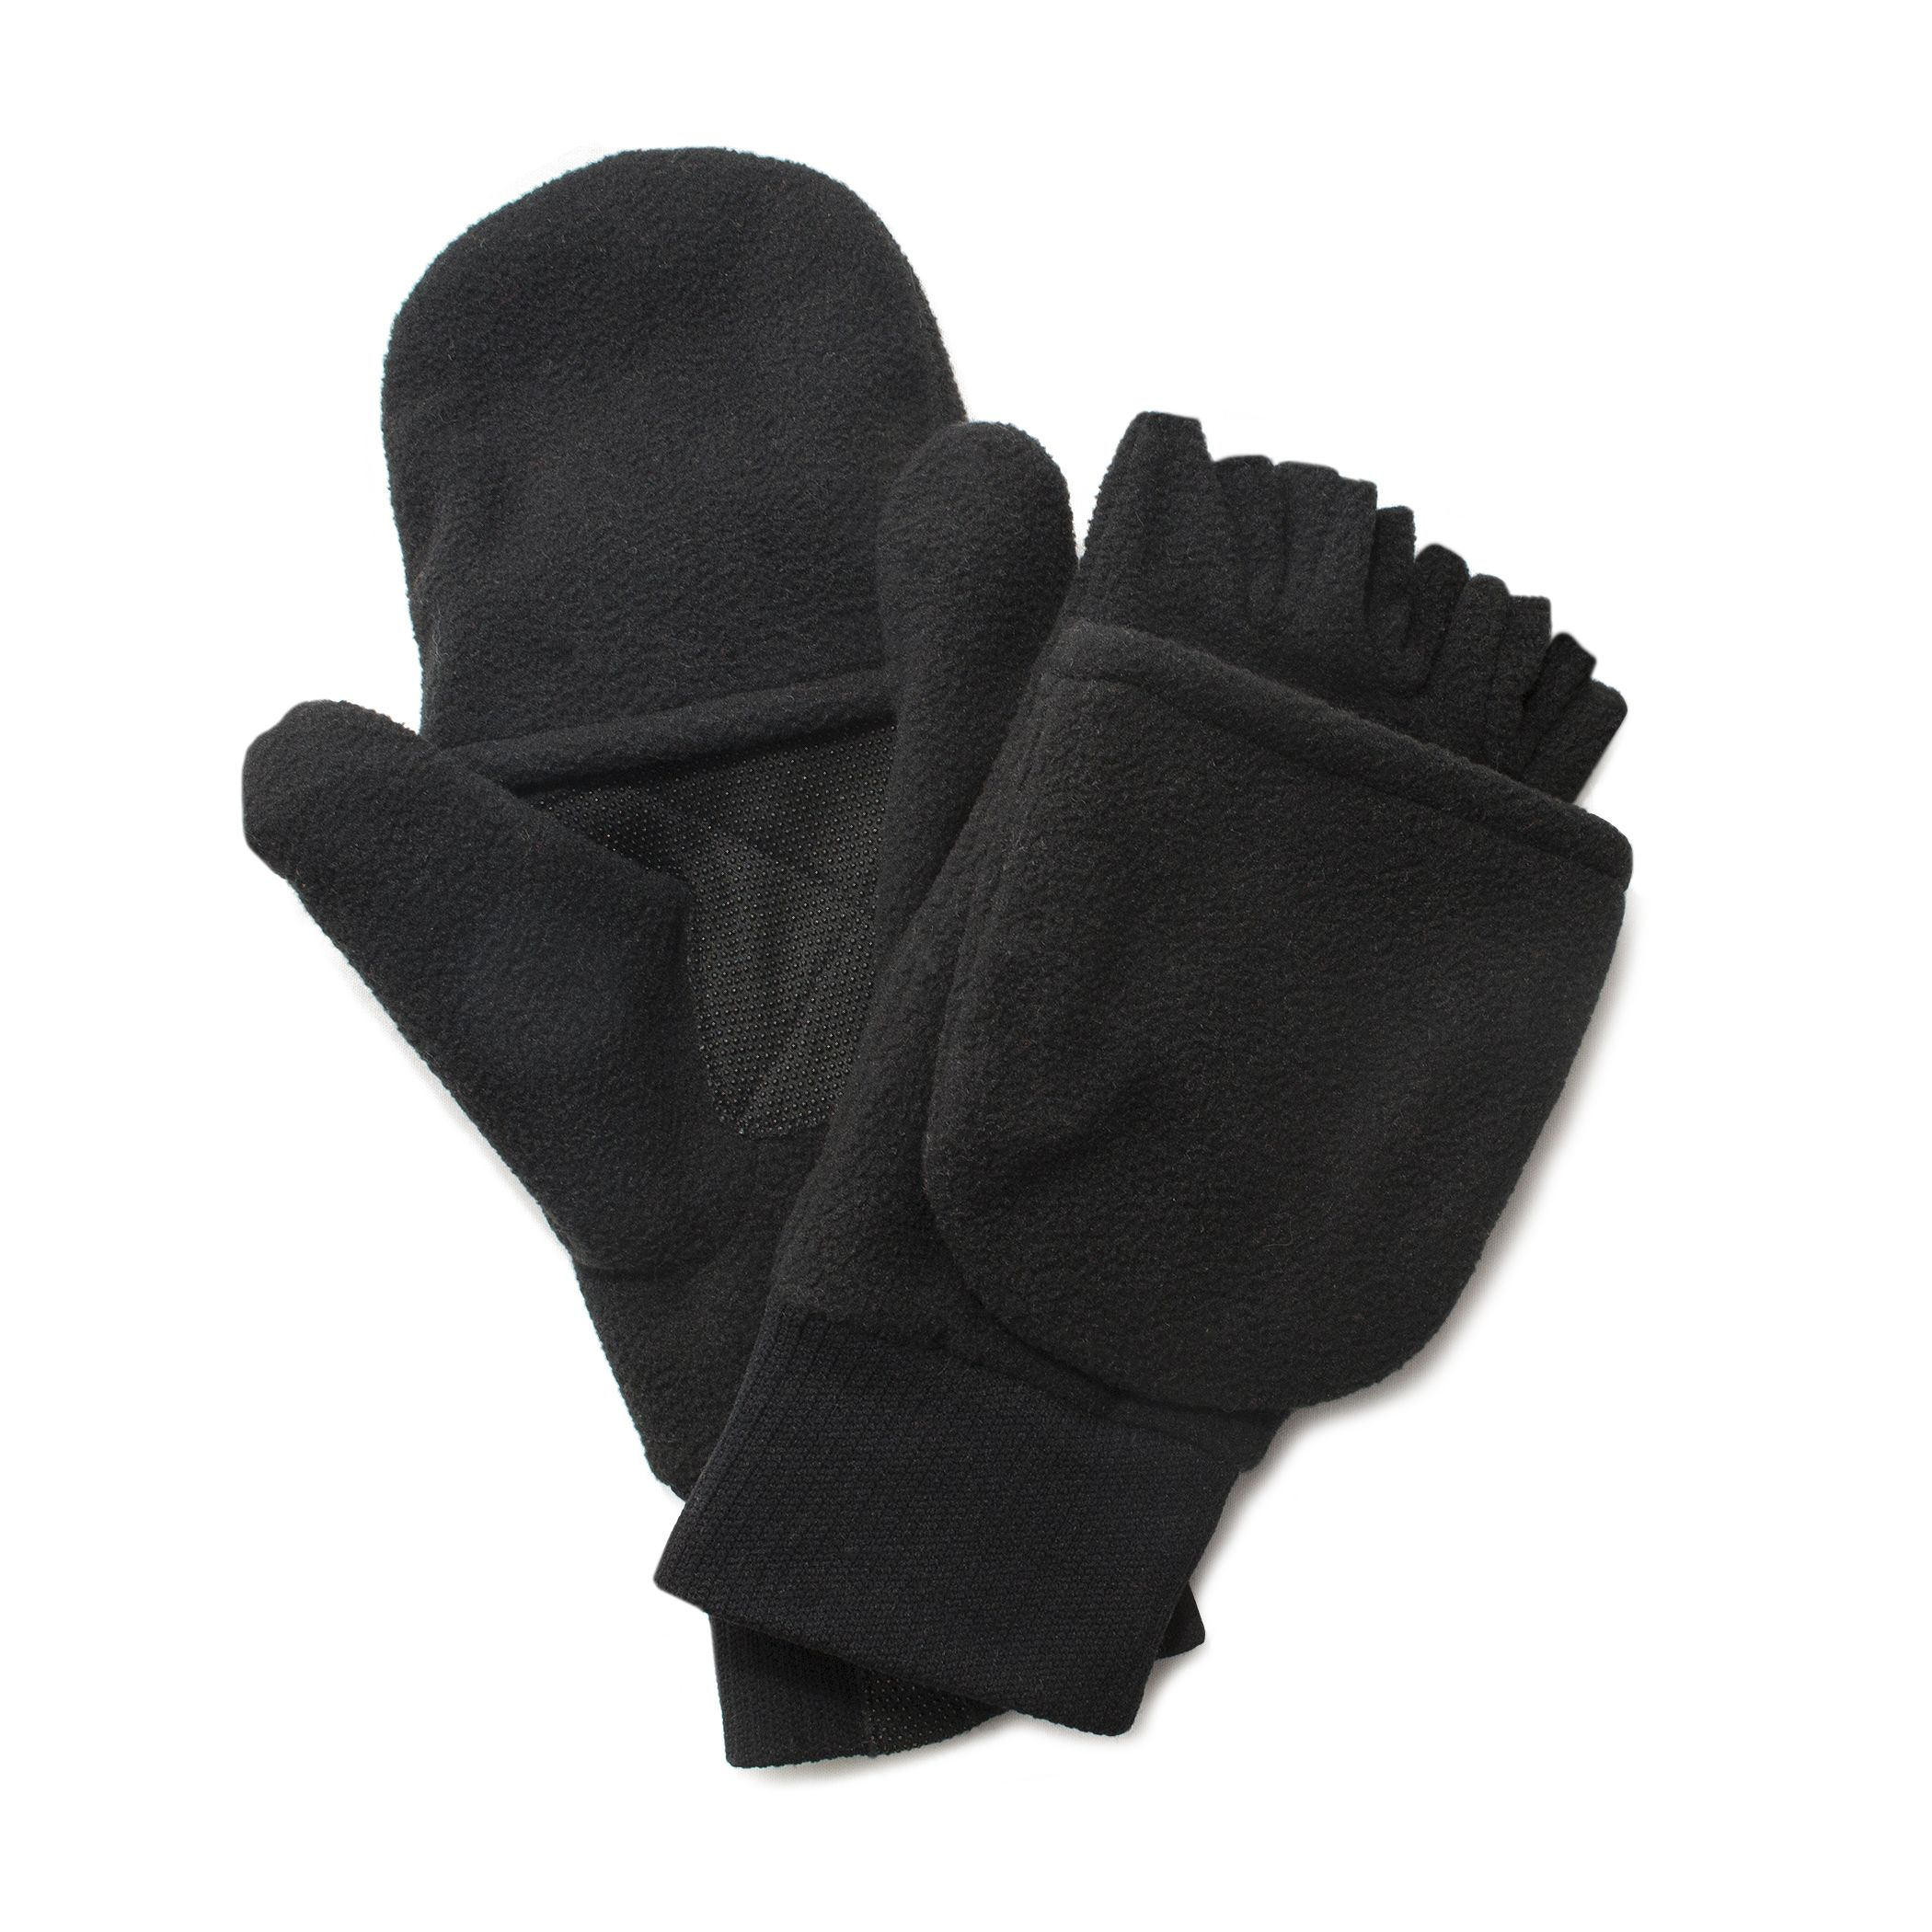 3pk wolverine leather work gloves extra large - Quietwear Fleece Flip Mittens Black Gloves Mittens Collection